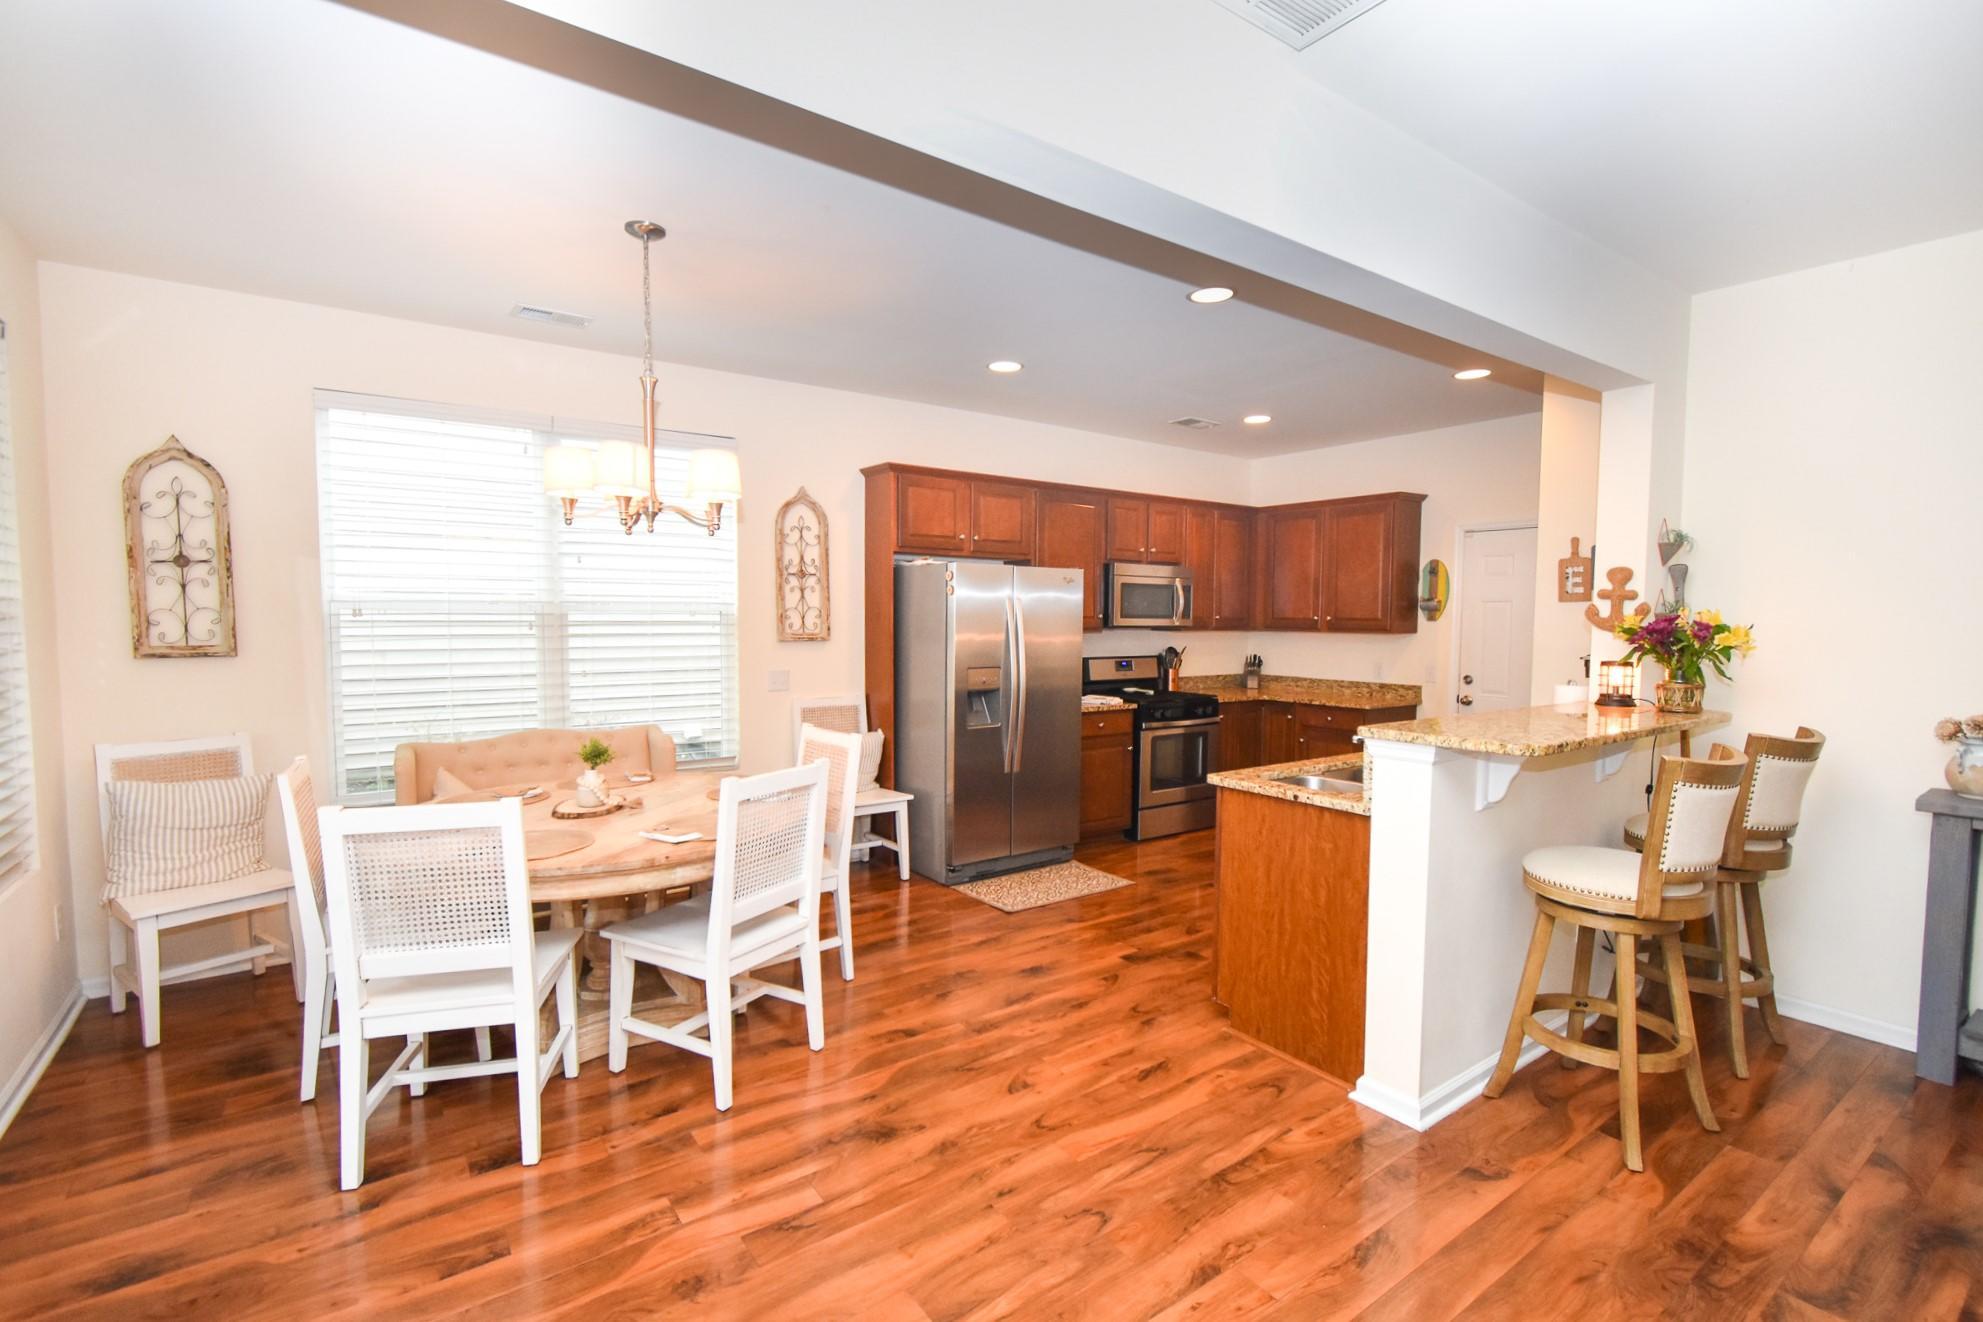 Lieben Park Homes For Sale - 3565 Locklear, Mount Pleasant, SC - 0